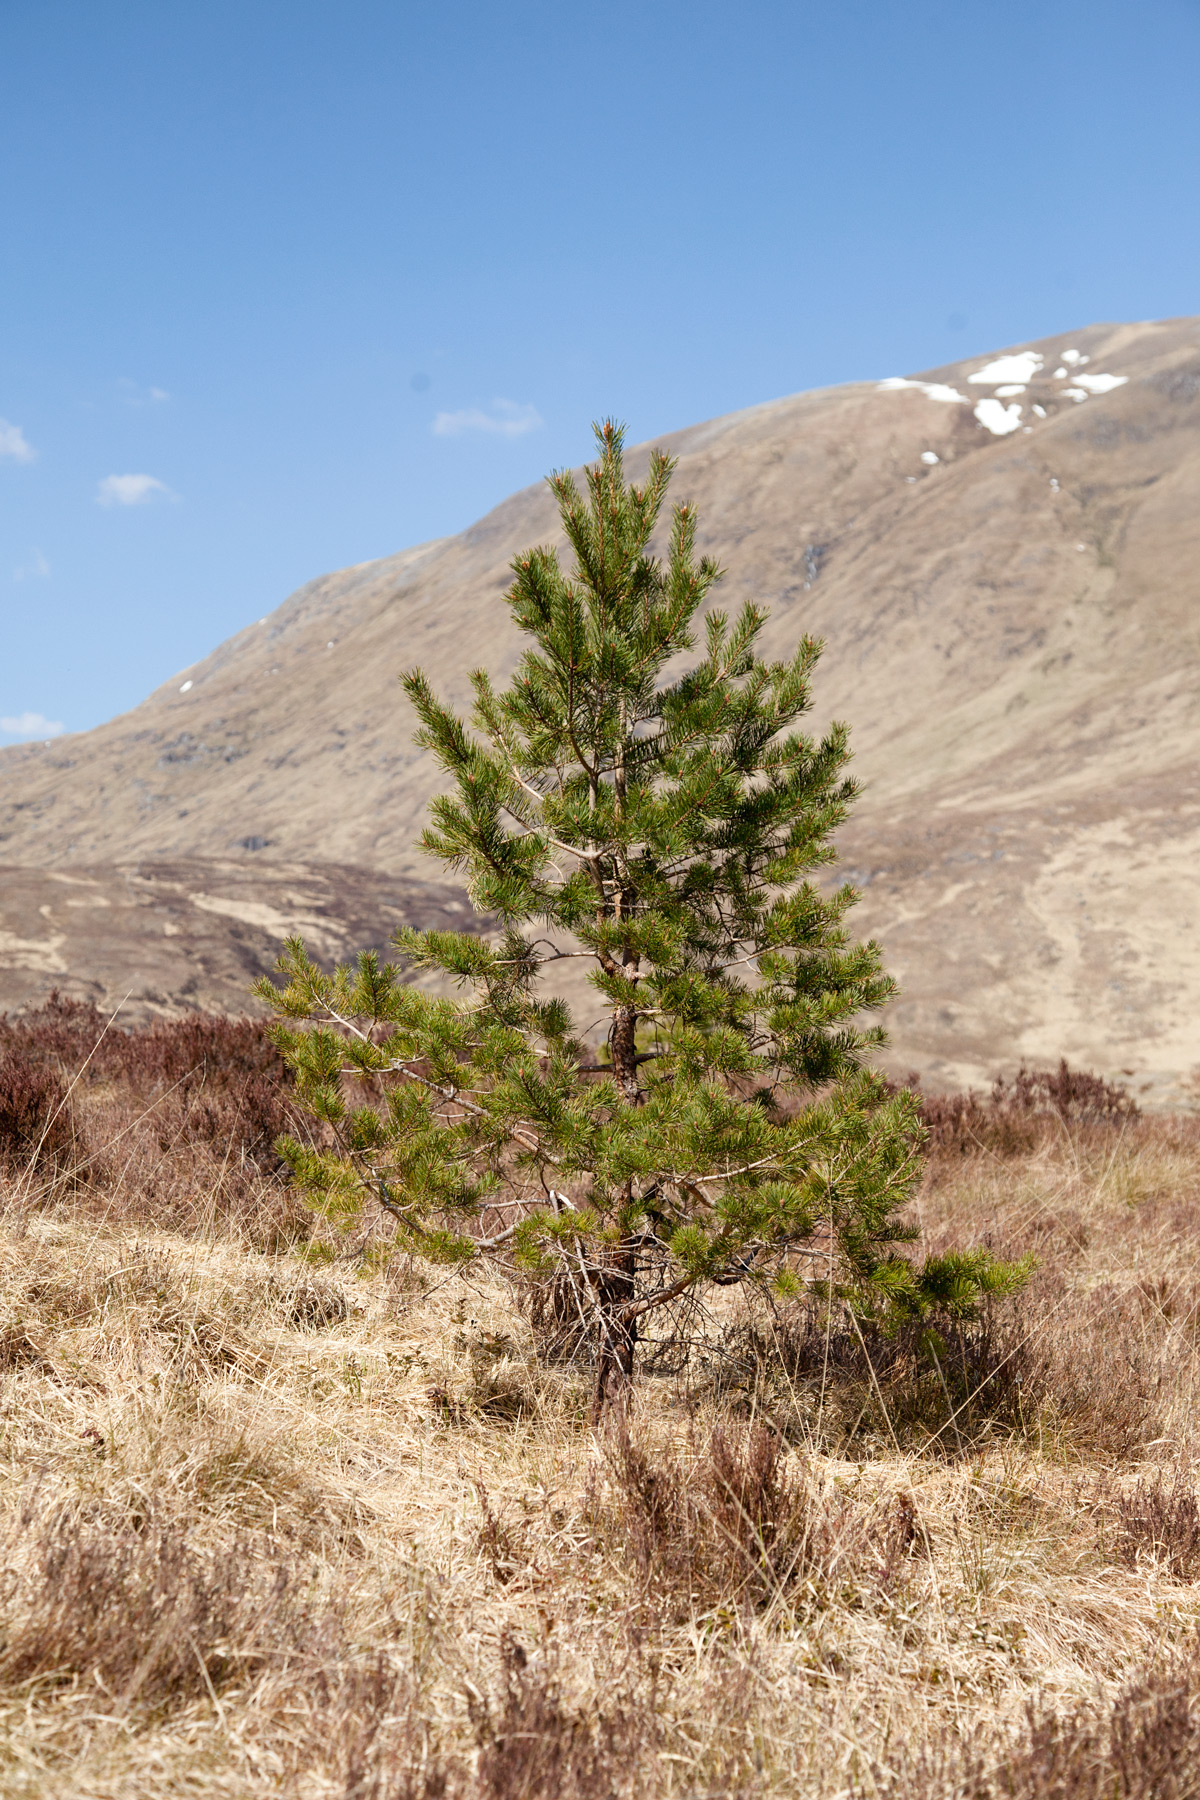 Trees-for-Life--Scotts-Pine-Image-by-Jody-Daunton.jpg